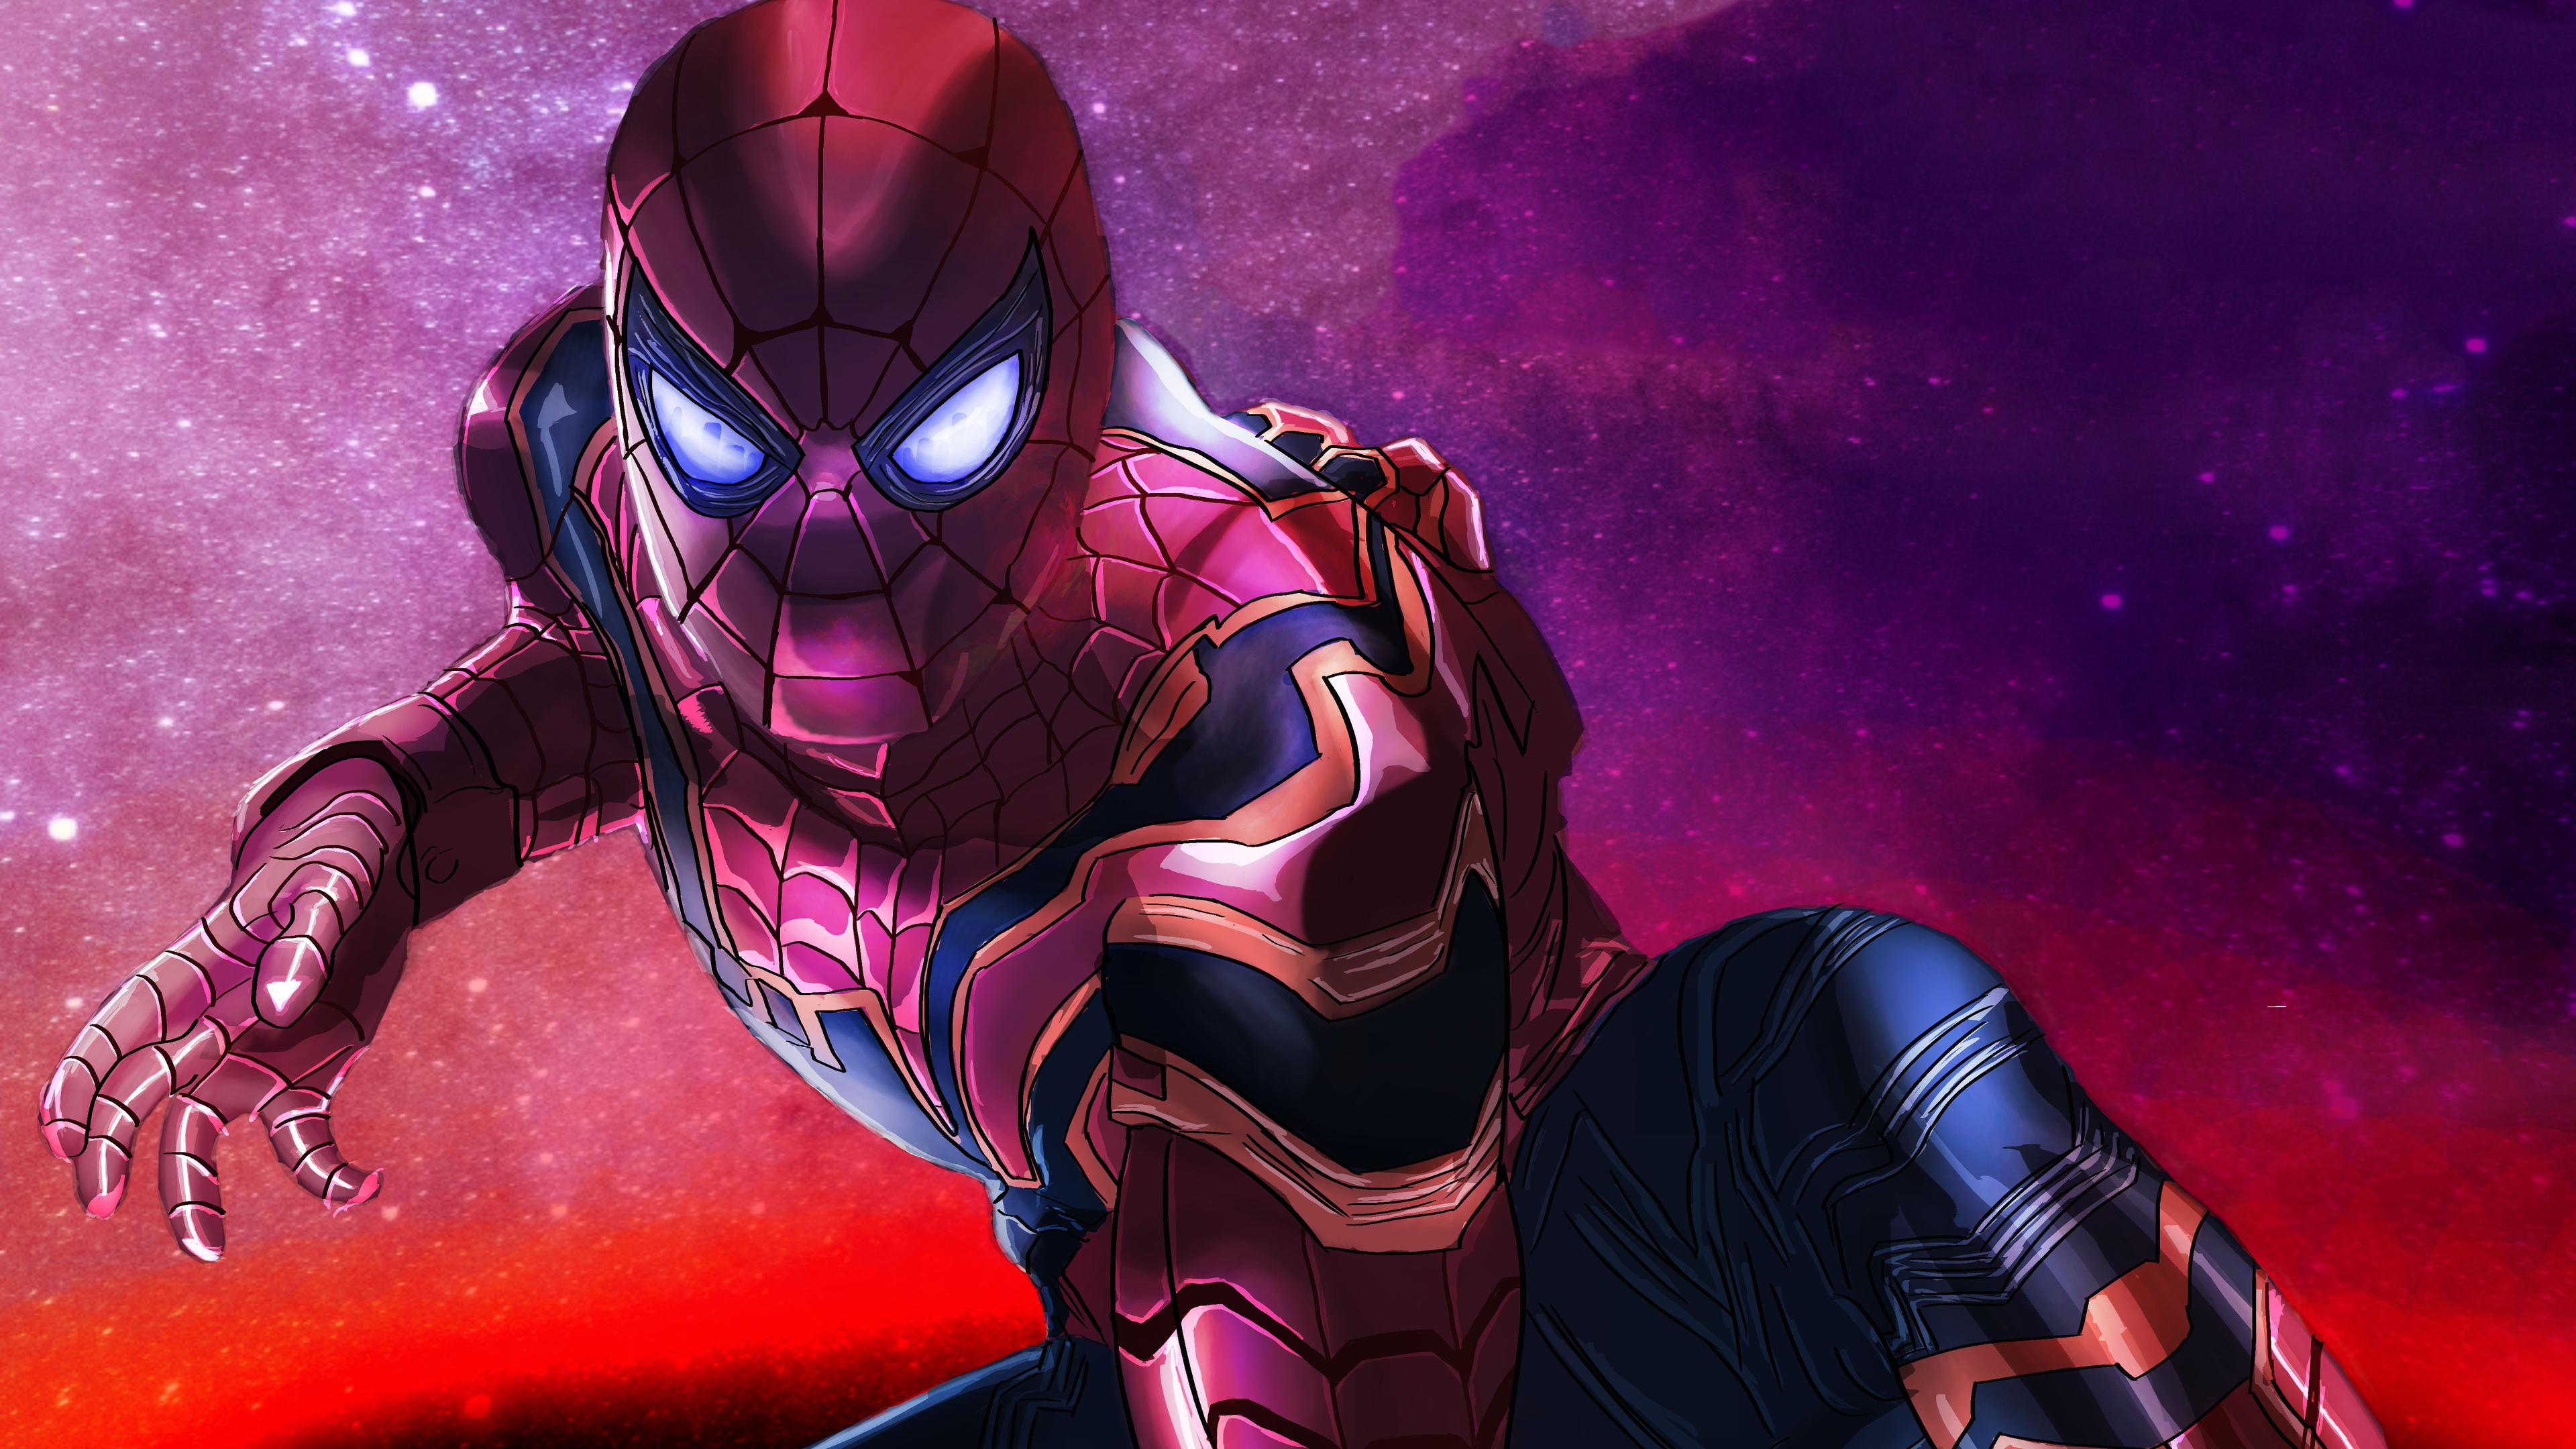 spiderman 4k avengers infinity war 1543620063 - Spiderman 4k Avengers Infinity War - superheroes wallpapers, spiderman wallpapers, hd-wallpapers, digital art wallpapers, avengers-infinity-war-wallpapers, artwork wallpapers, 4k-wallpapers